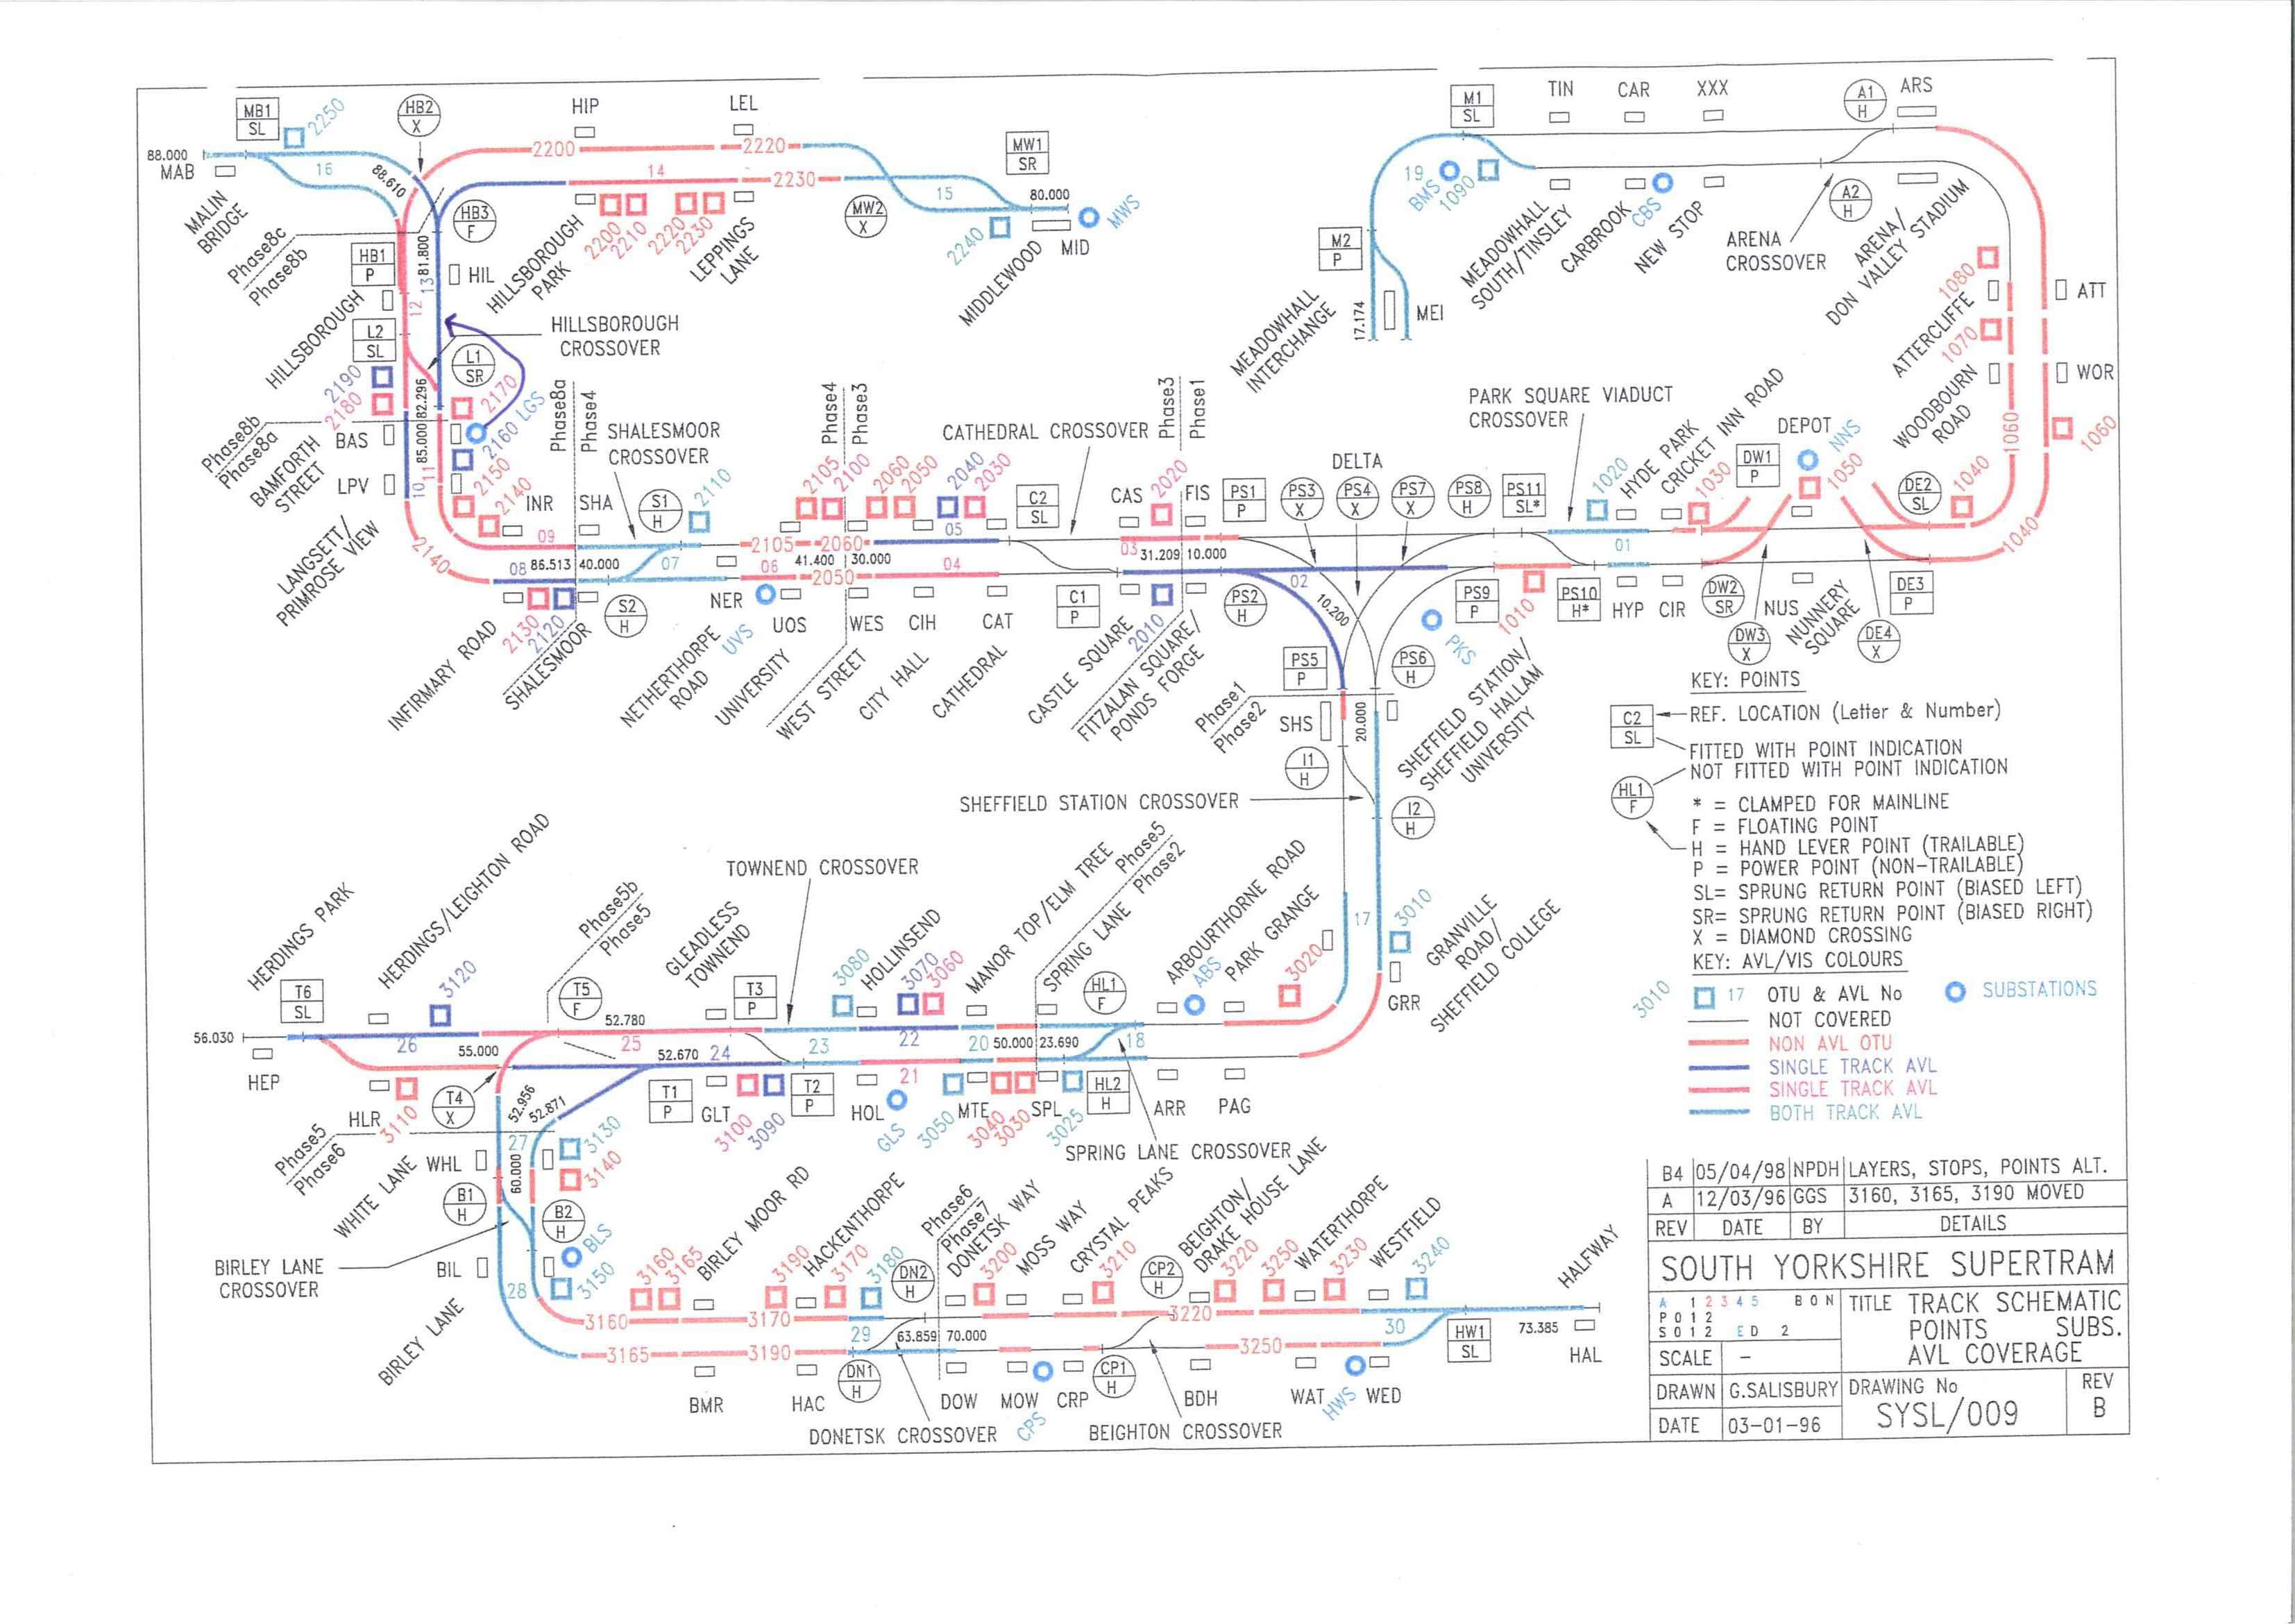 Supertram Track Layout